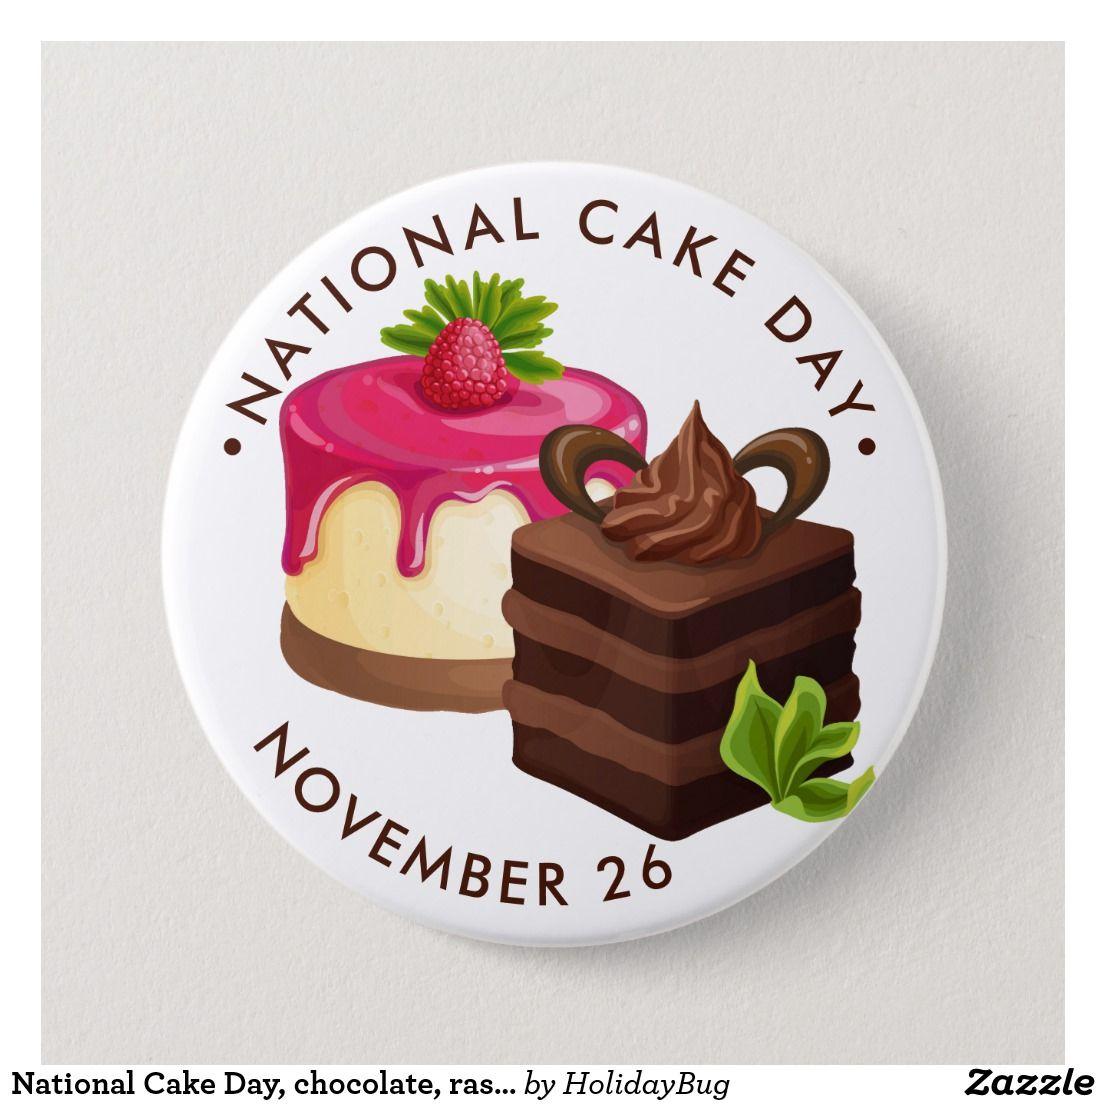 National Cake Day Chocolate Raspberry Cake Button Zazzle Com In 2021 Raspberry Cake Savoury Cake Cake Day